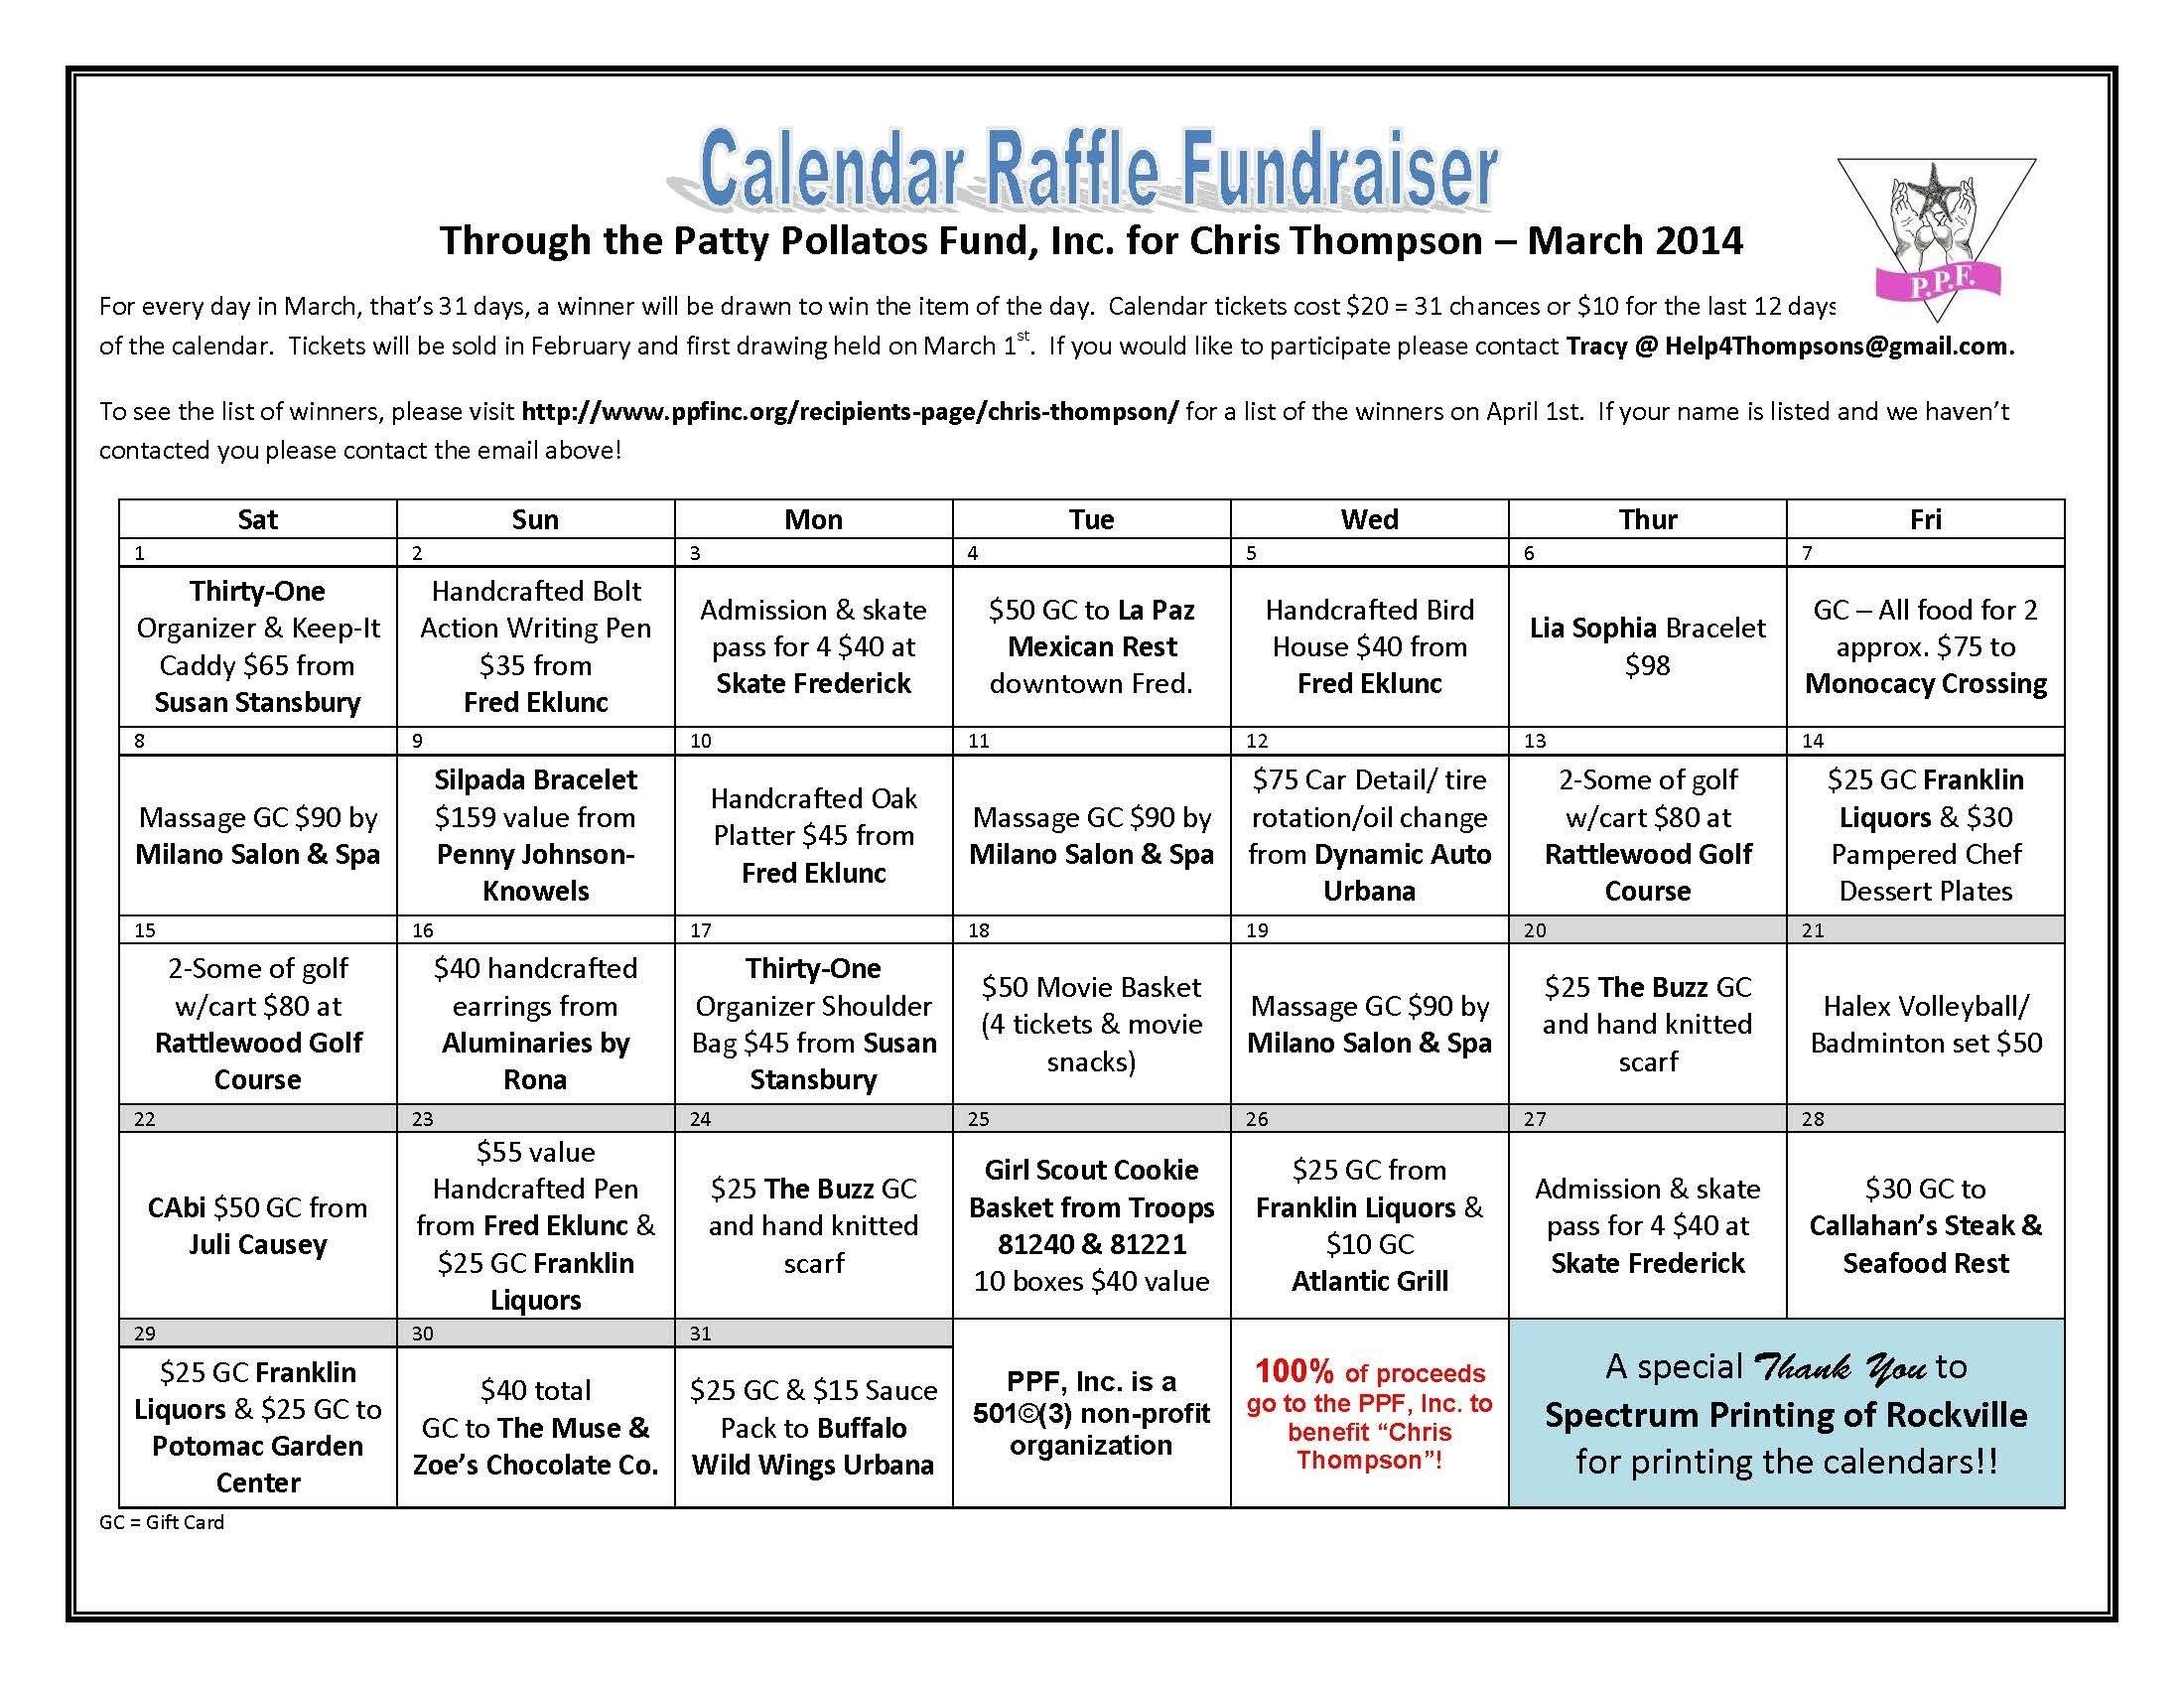 Chris Thompson Calendar Raffle (With Images)   Fundraising